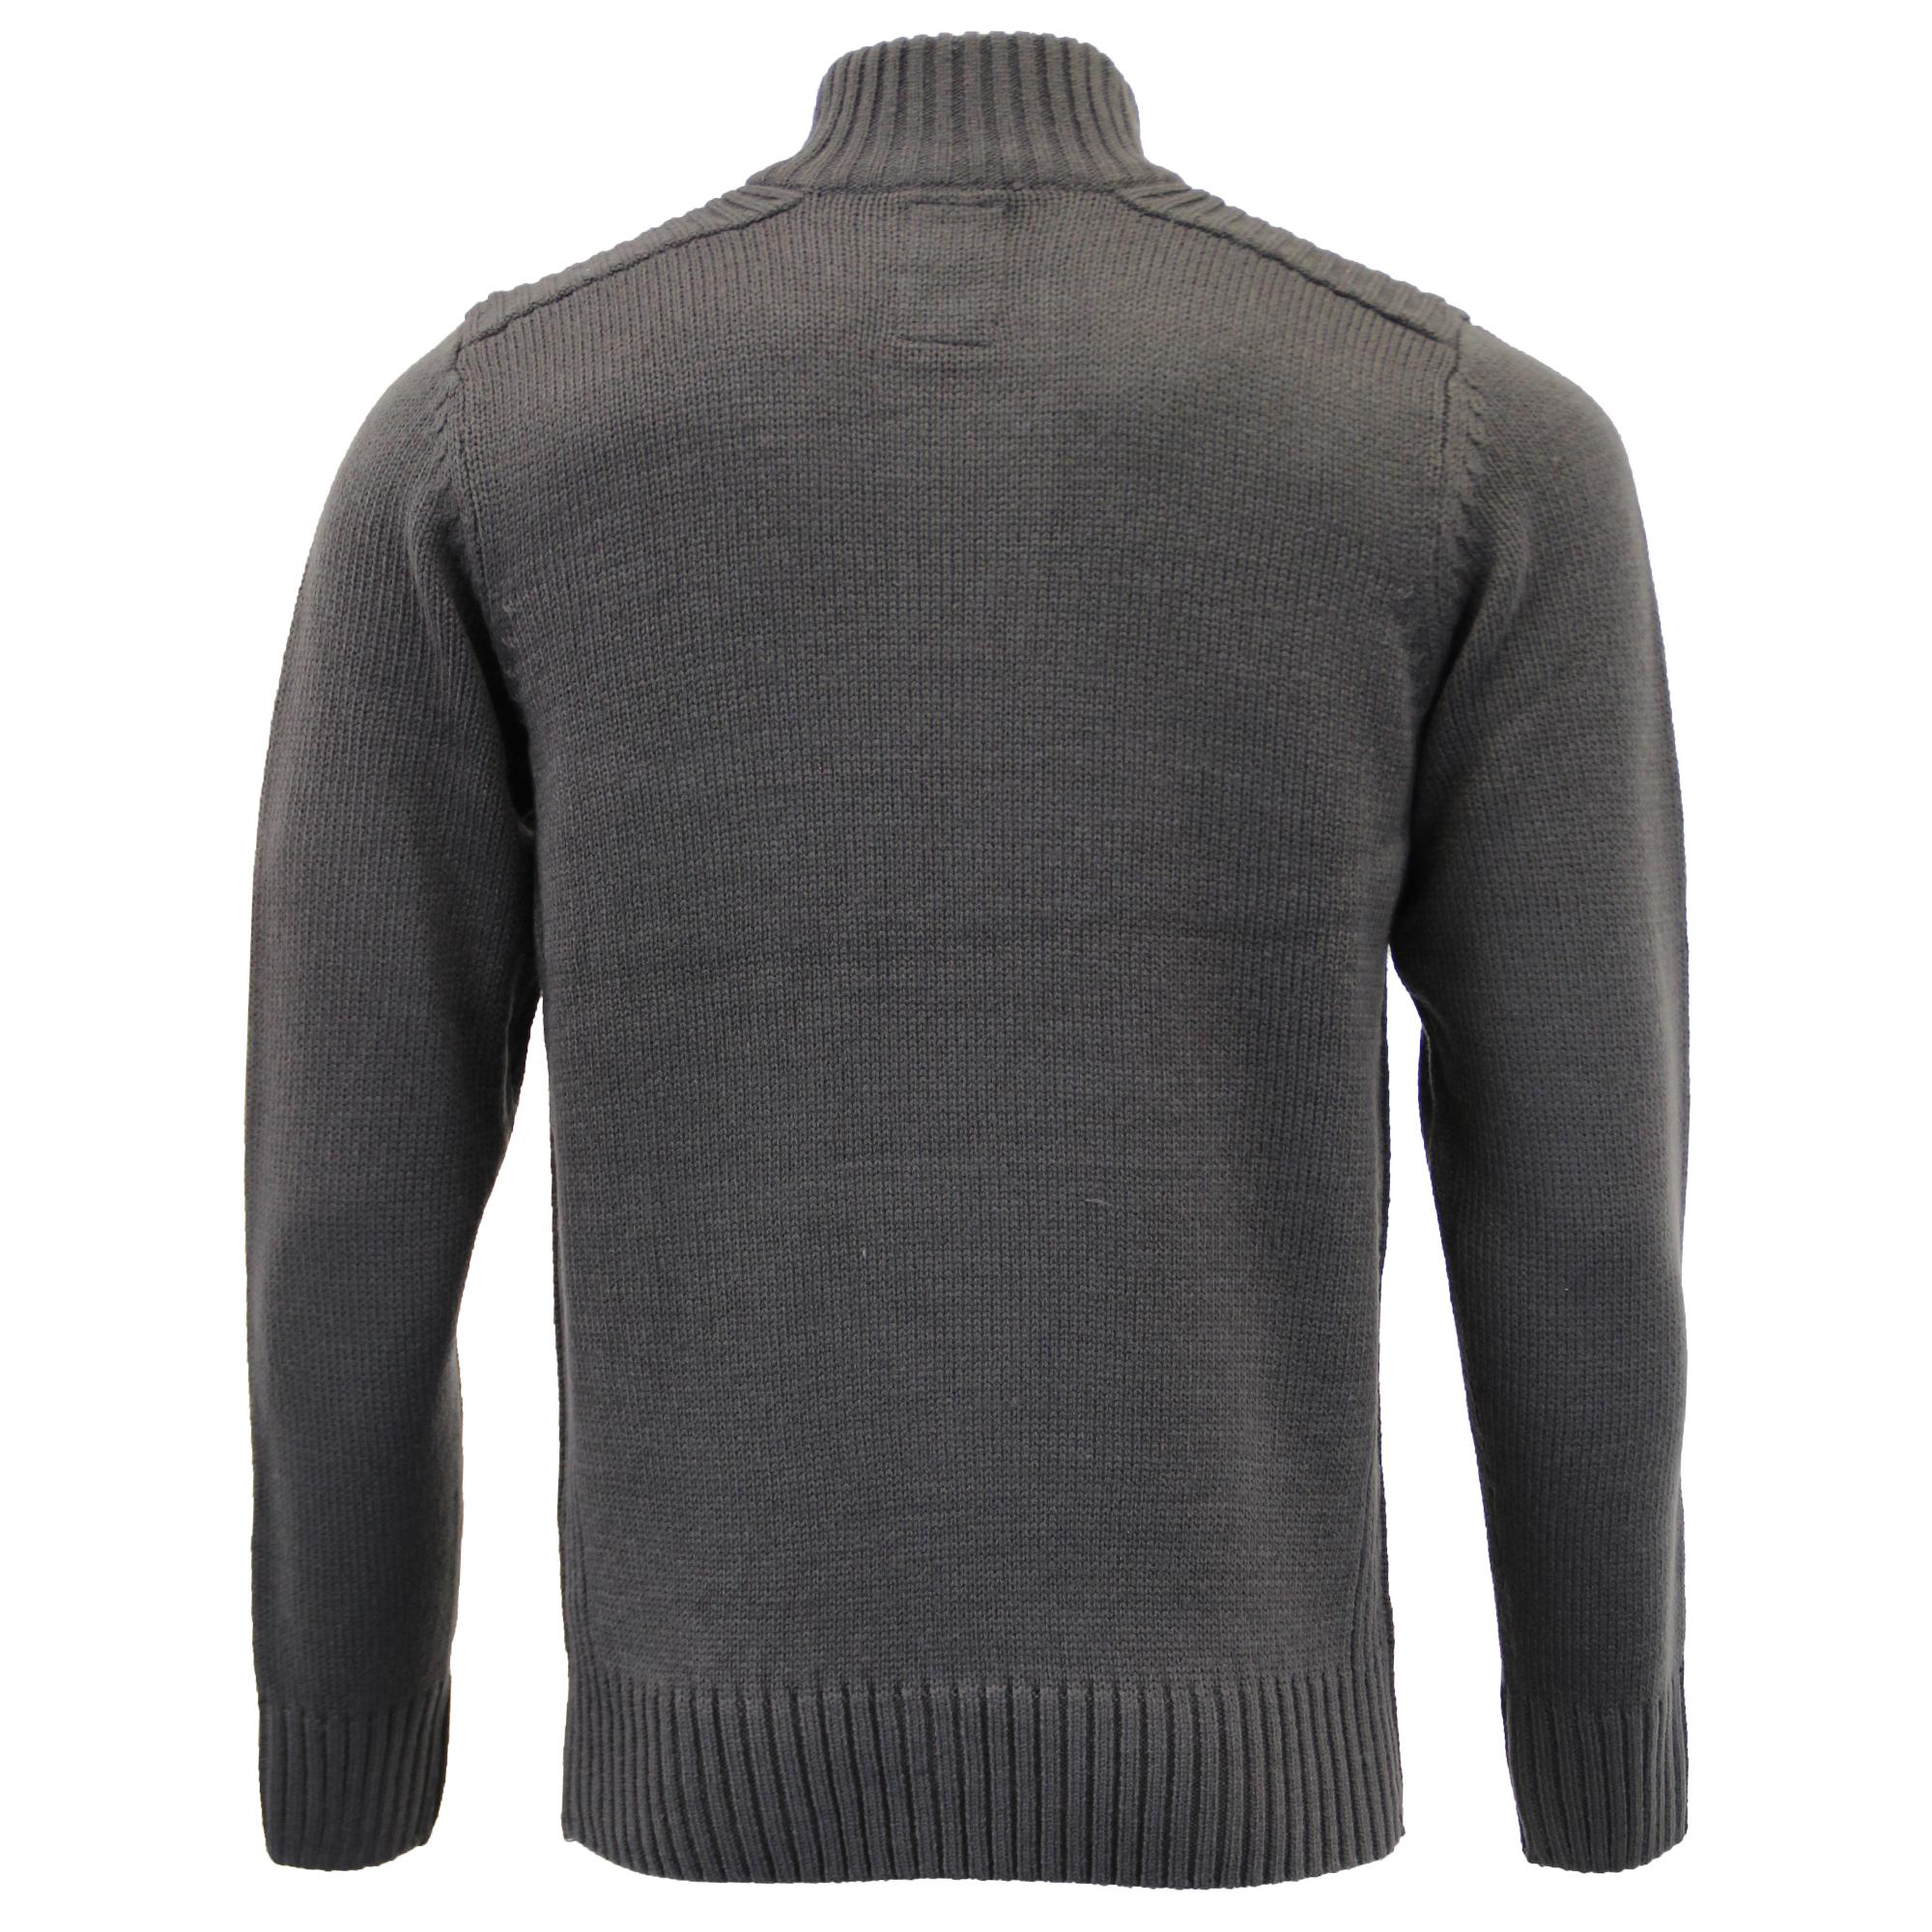 Mens-Knitted-Jumper-Kensington-Eastside-Sweater-Pullover-Top-Funnel-Neck-Winter thumbnail 5